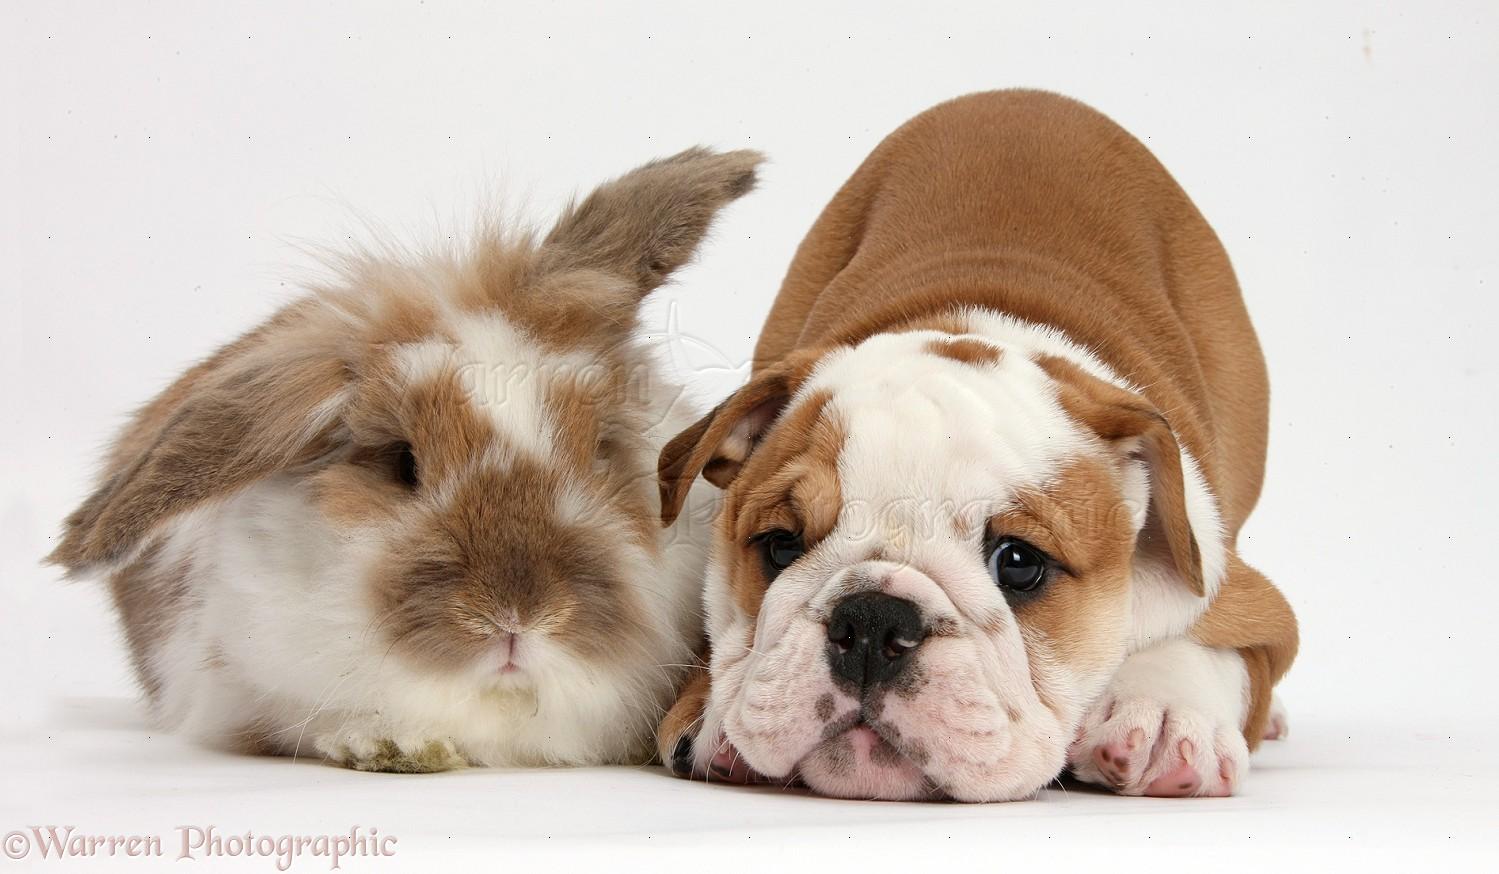 Pets: Bulldog puppy and Lionhead-Lop rabbit photo - WP39222